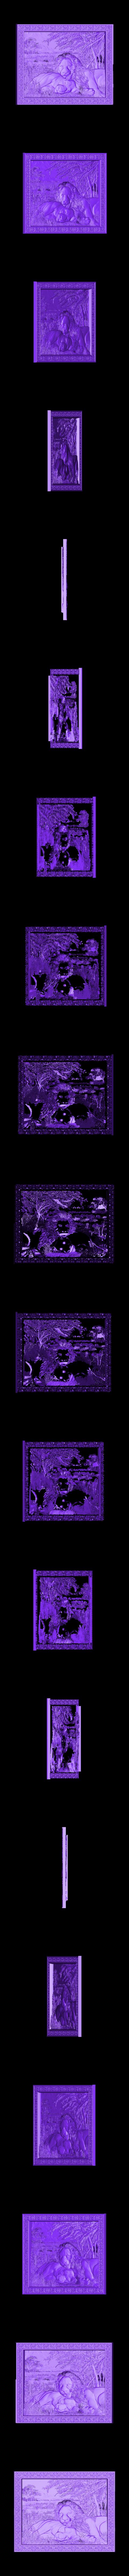 941. Panno.STL Download free STL file Lions • 3D printing object, stl3dmodel